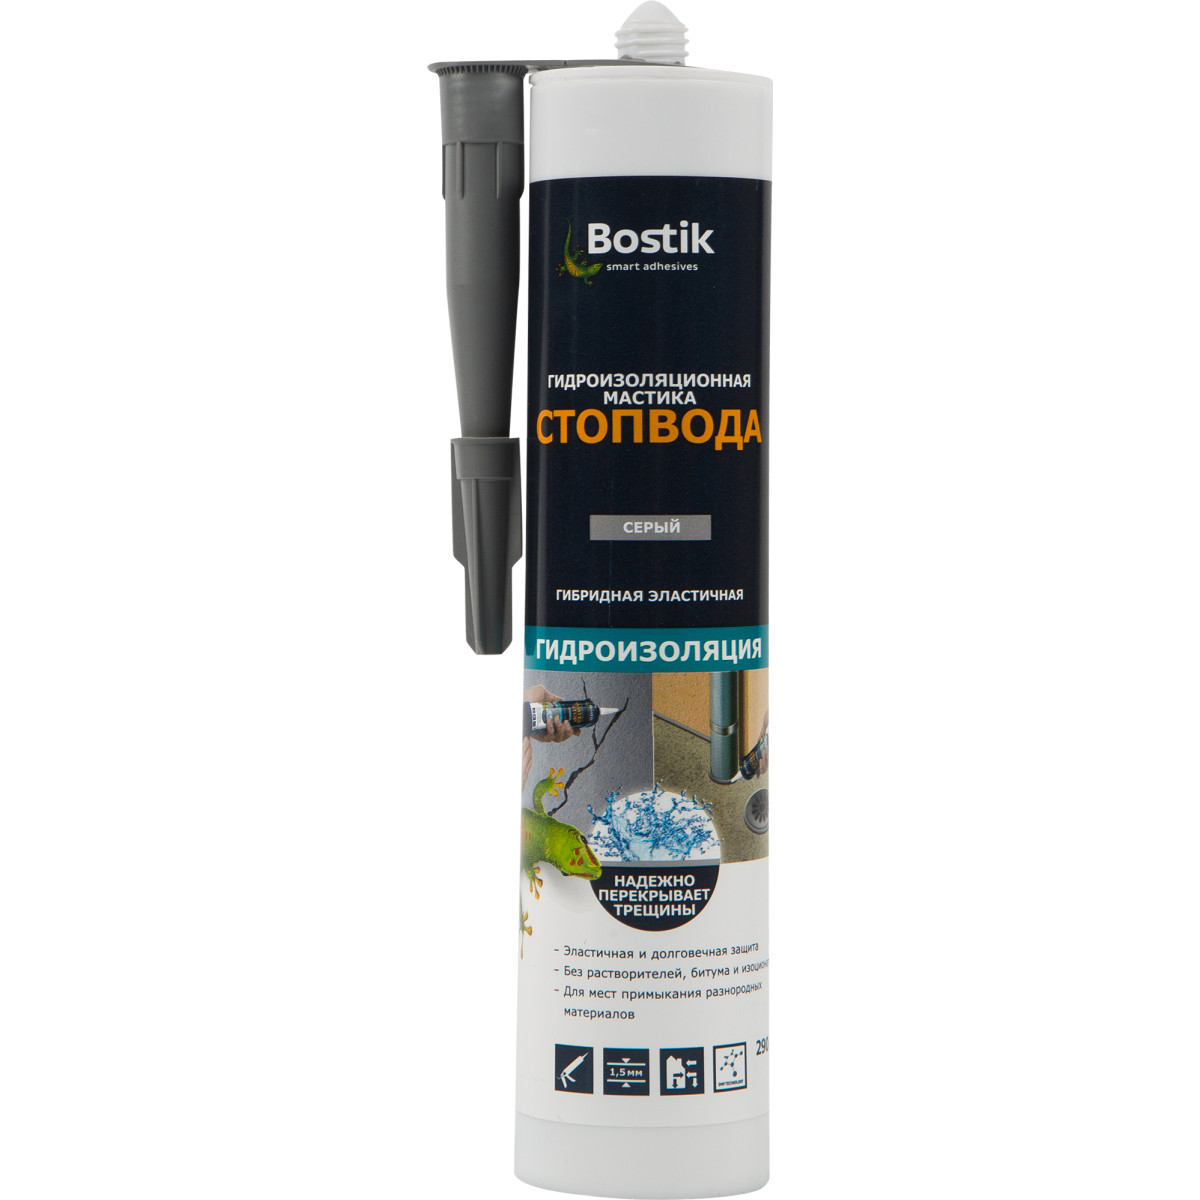 Мастика Bostik СтопВода гидроизоляционная 0.29 л